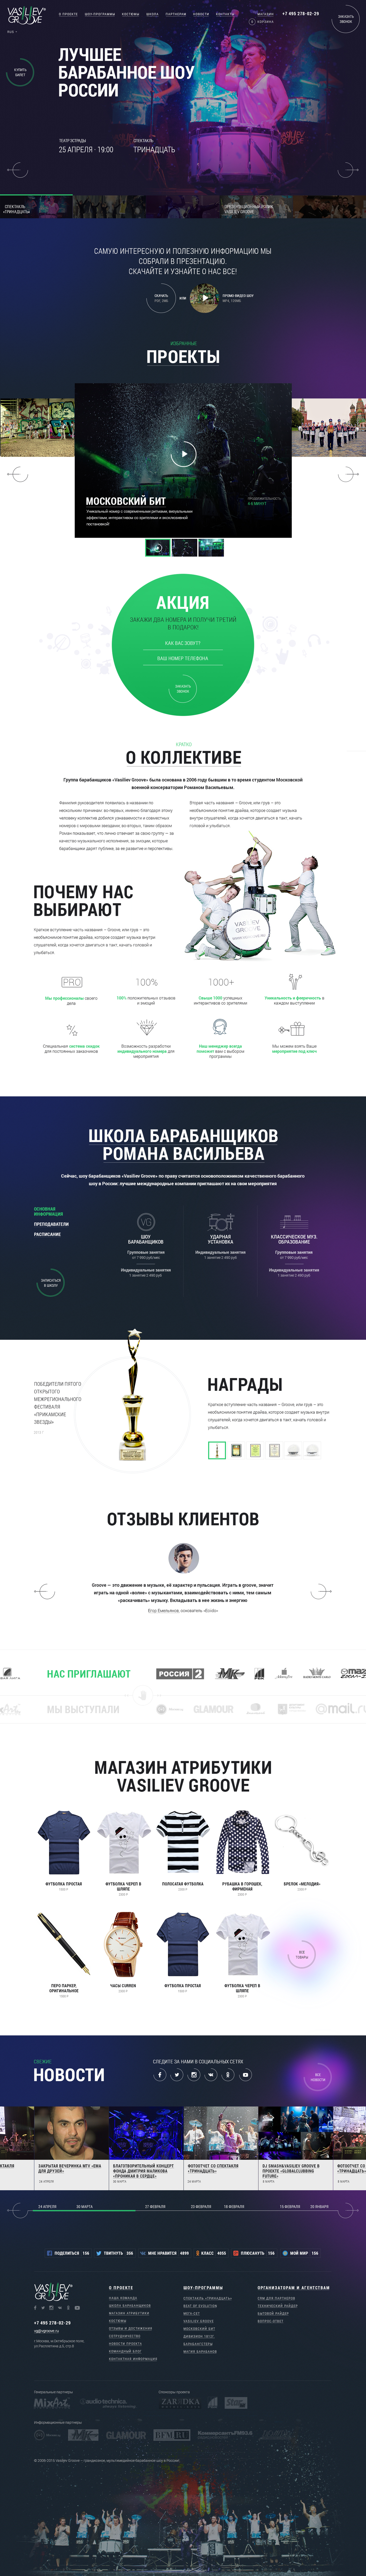 vgroove_homepage